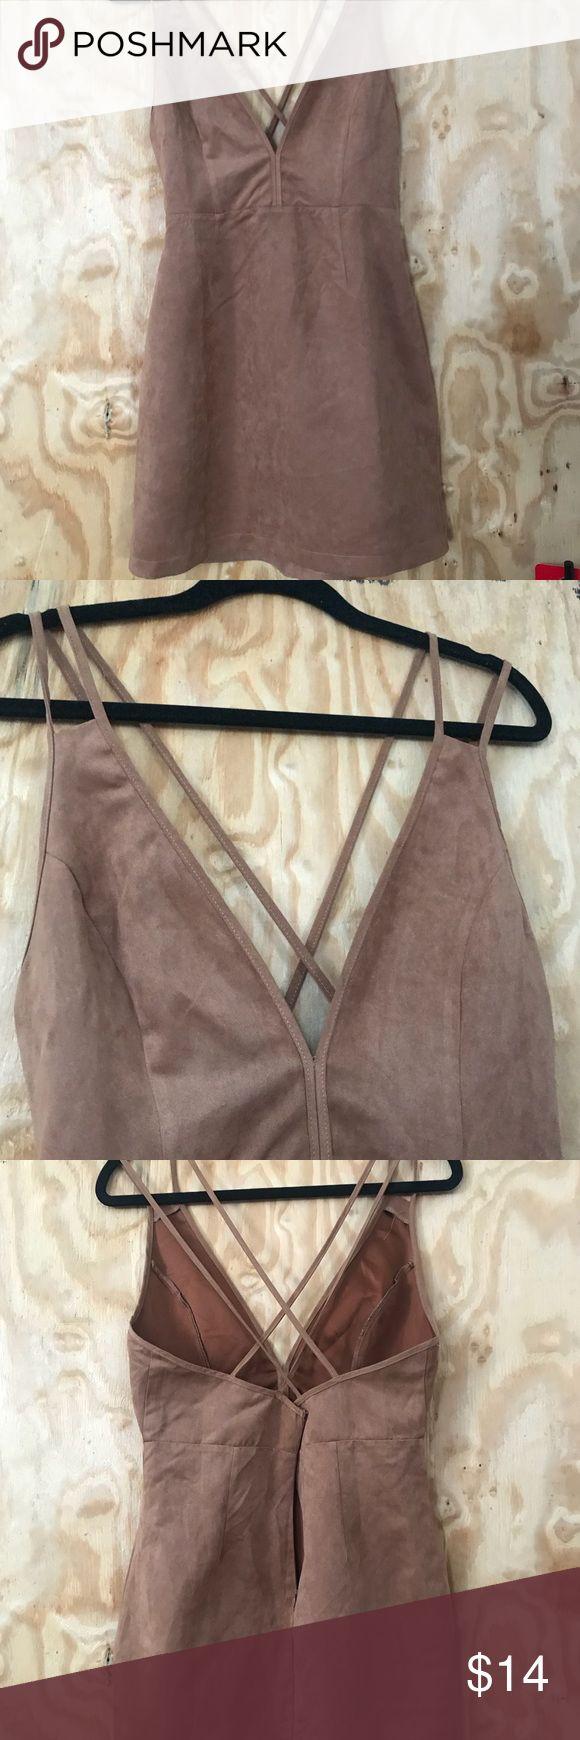 Brown strappy mini dress Camel brown suede mini dress v neck strappy w zipper detail Dresses Mini